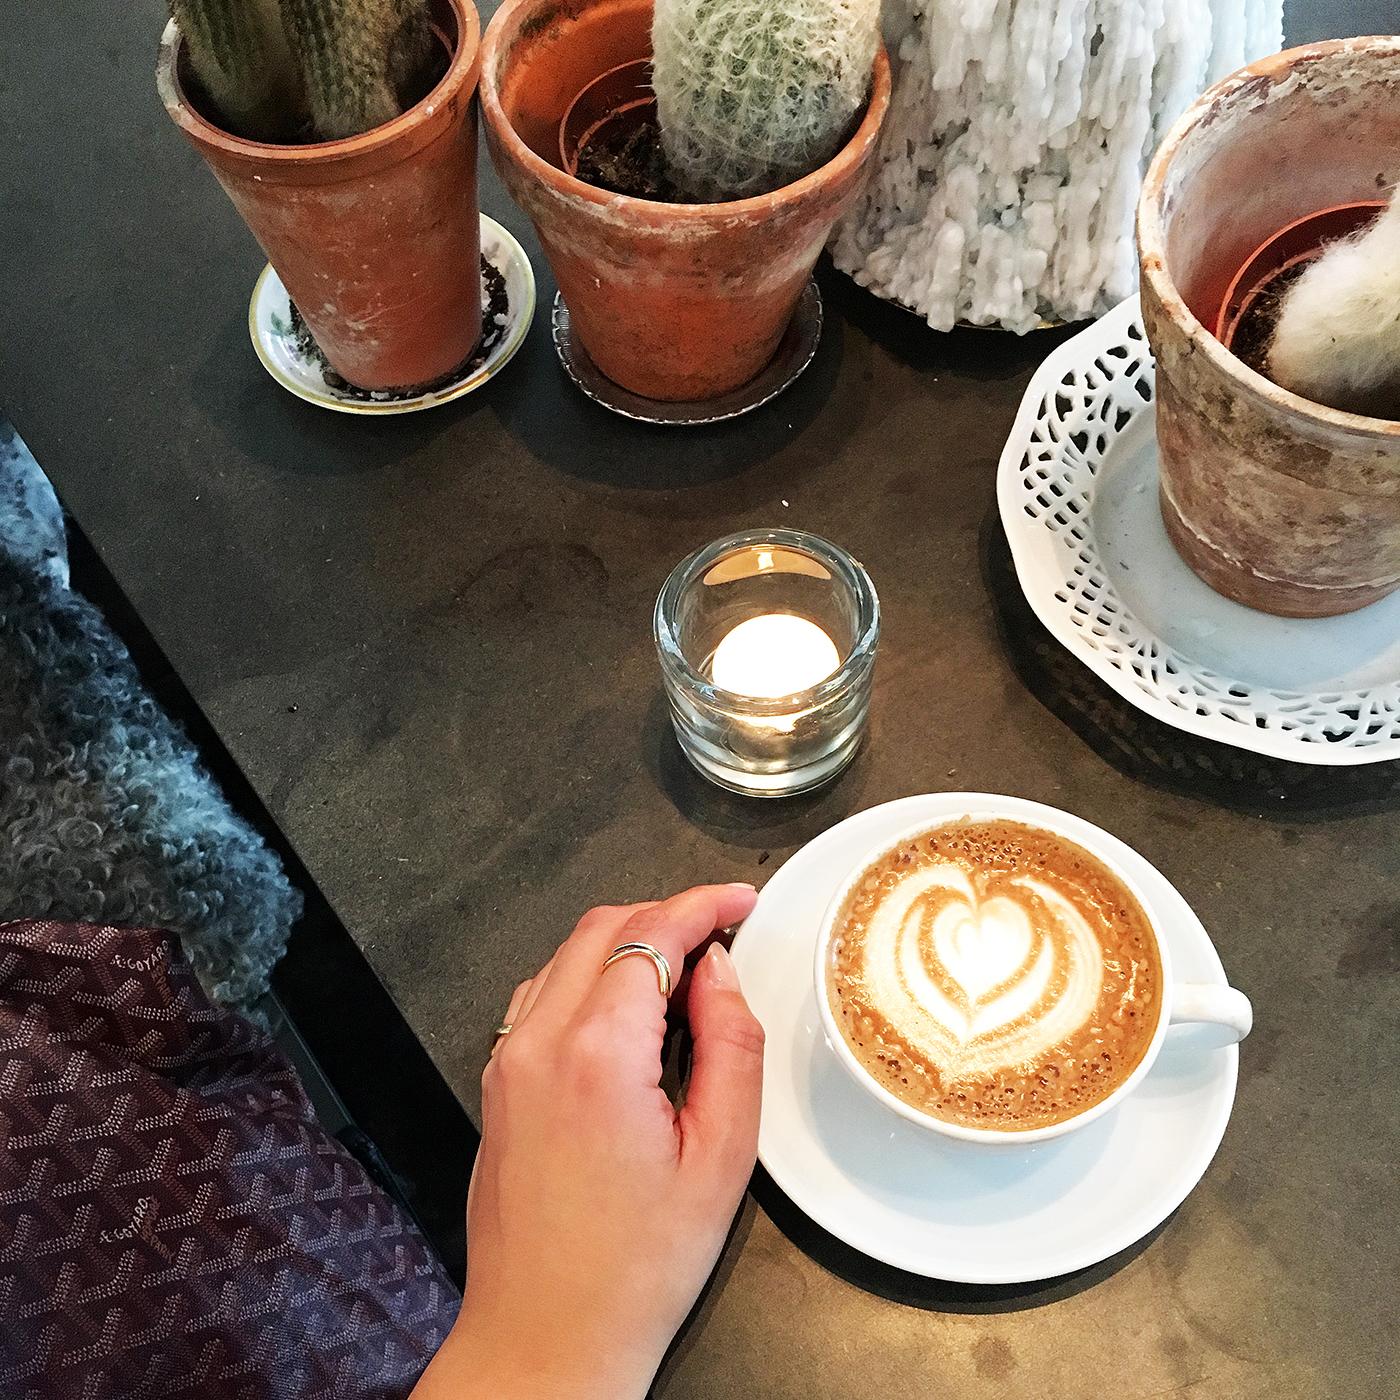 Felice Dahl Kaffeverket